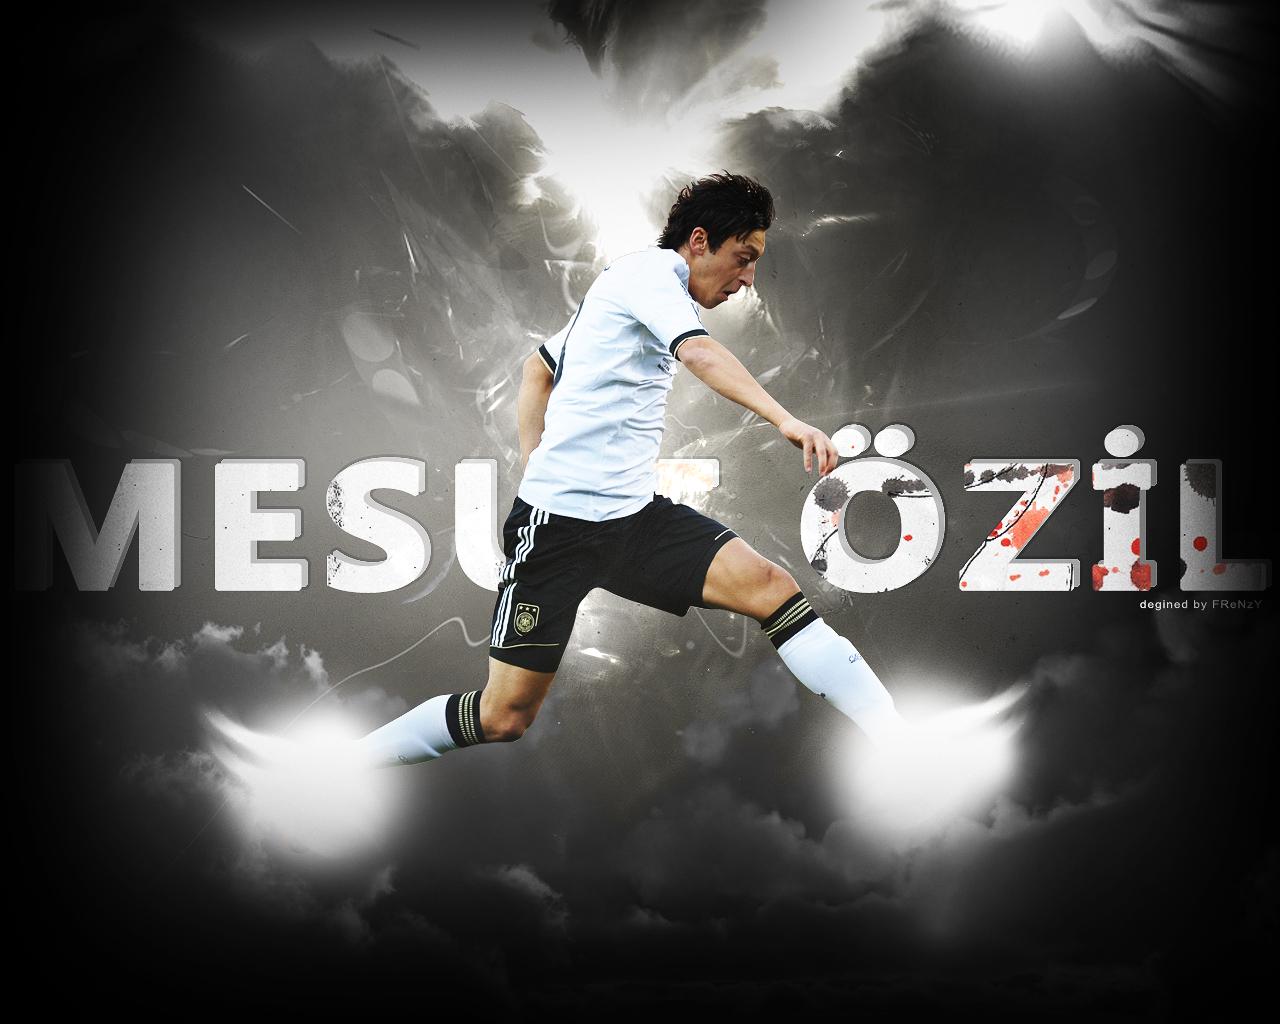 World Sports Hd Wallpapers: Real Madrid Mesut Ozil Hd